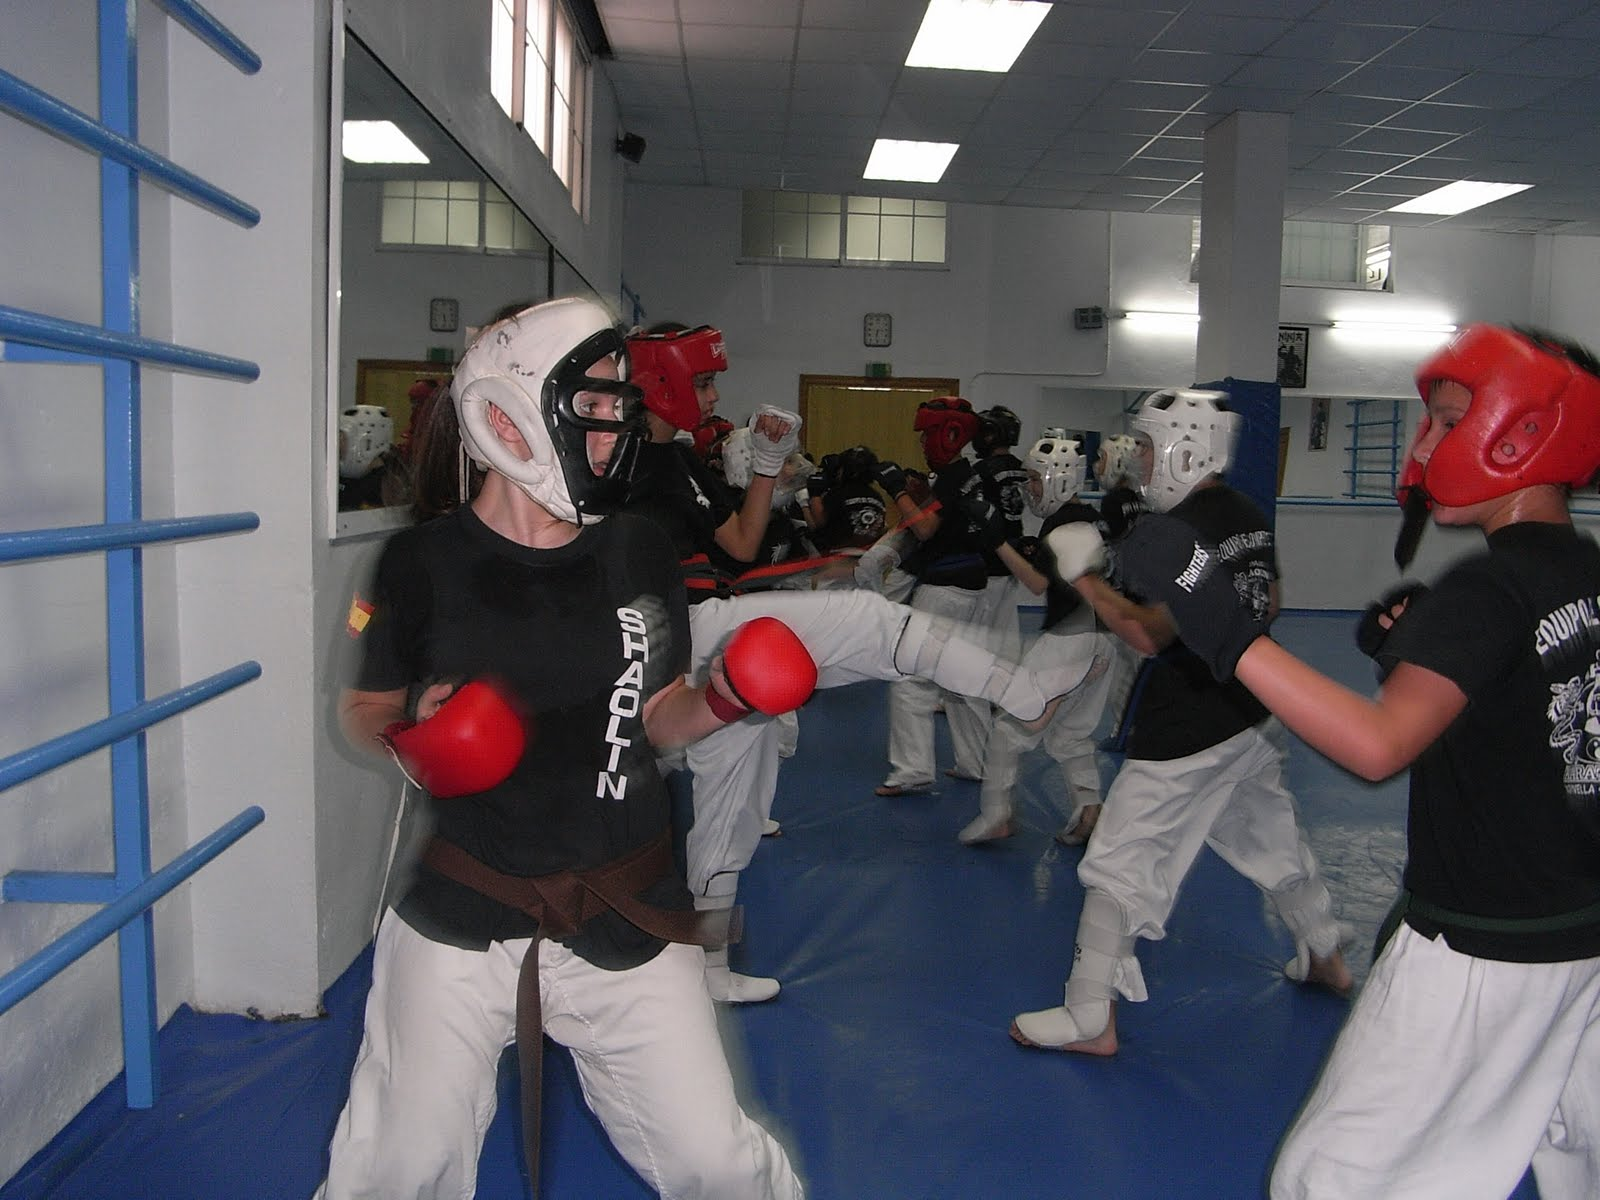 noticias deportivo shaolin 100 combates de karate